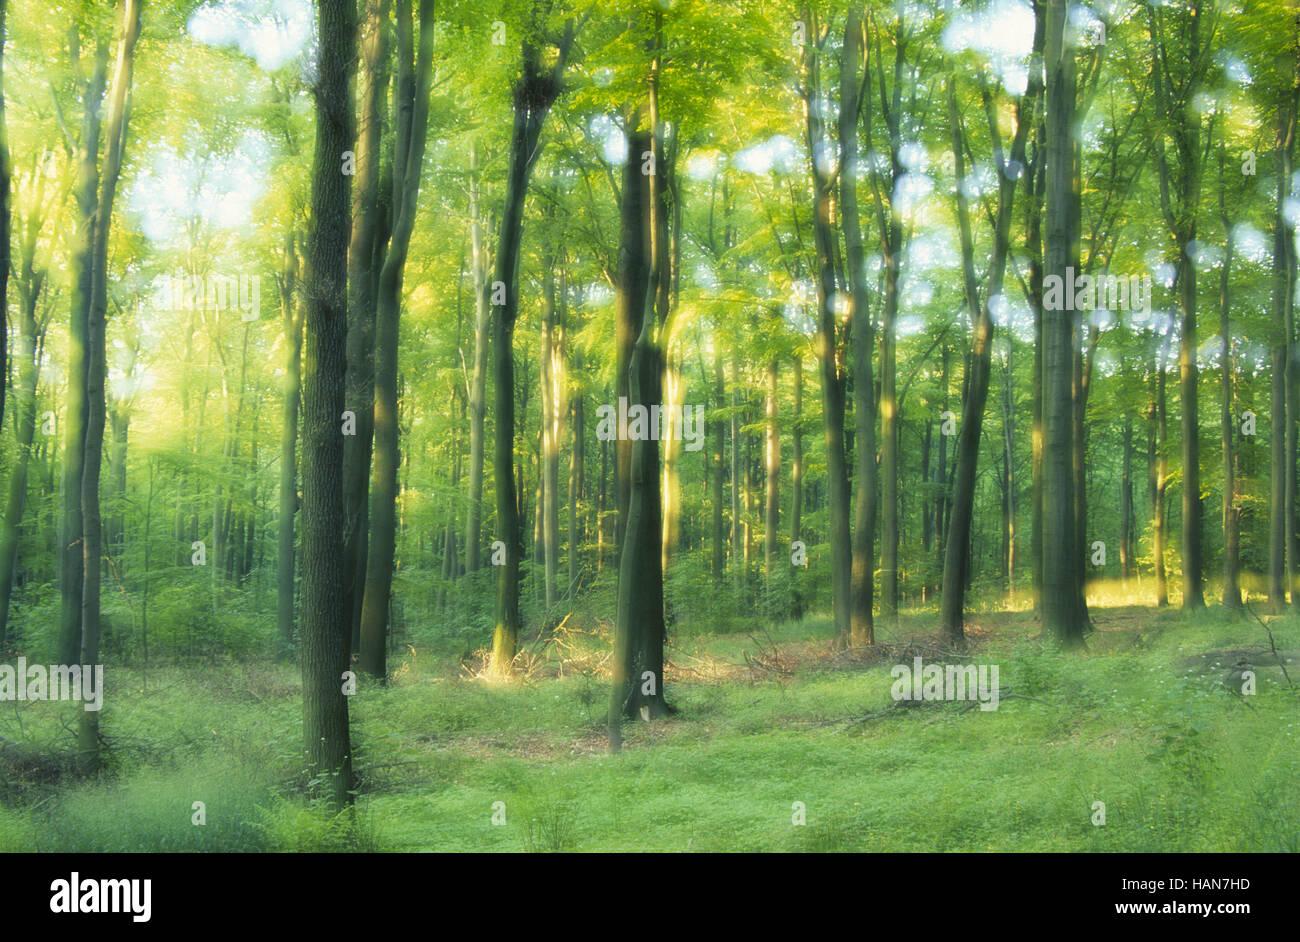 Deciduous Forest / Laubwald - Stock Image